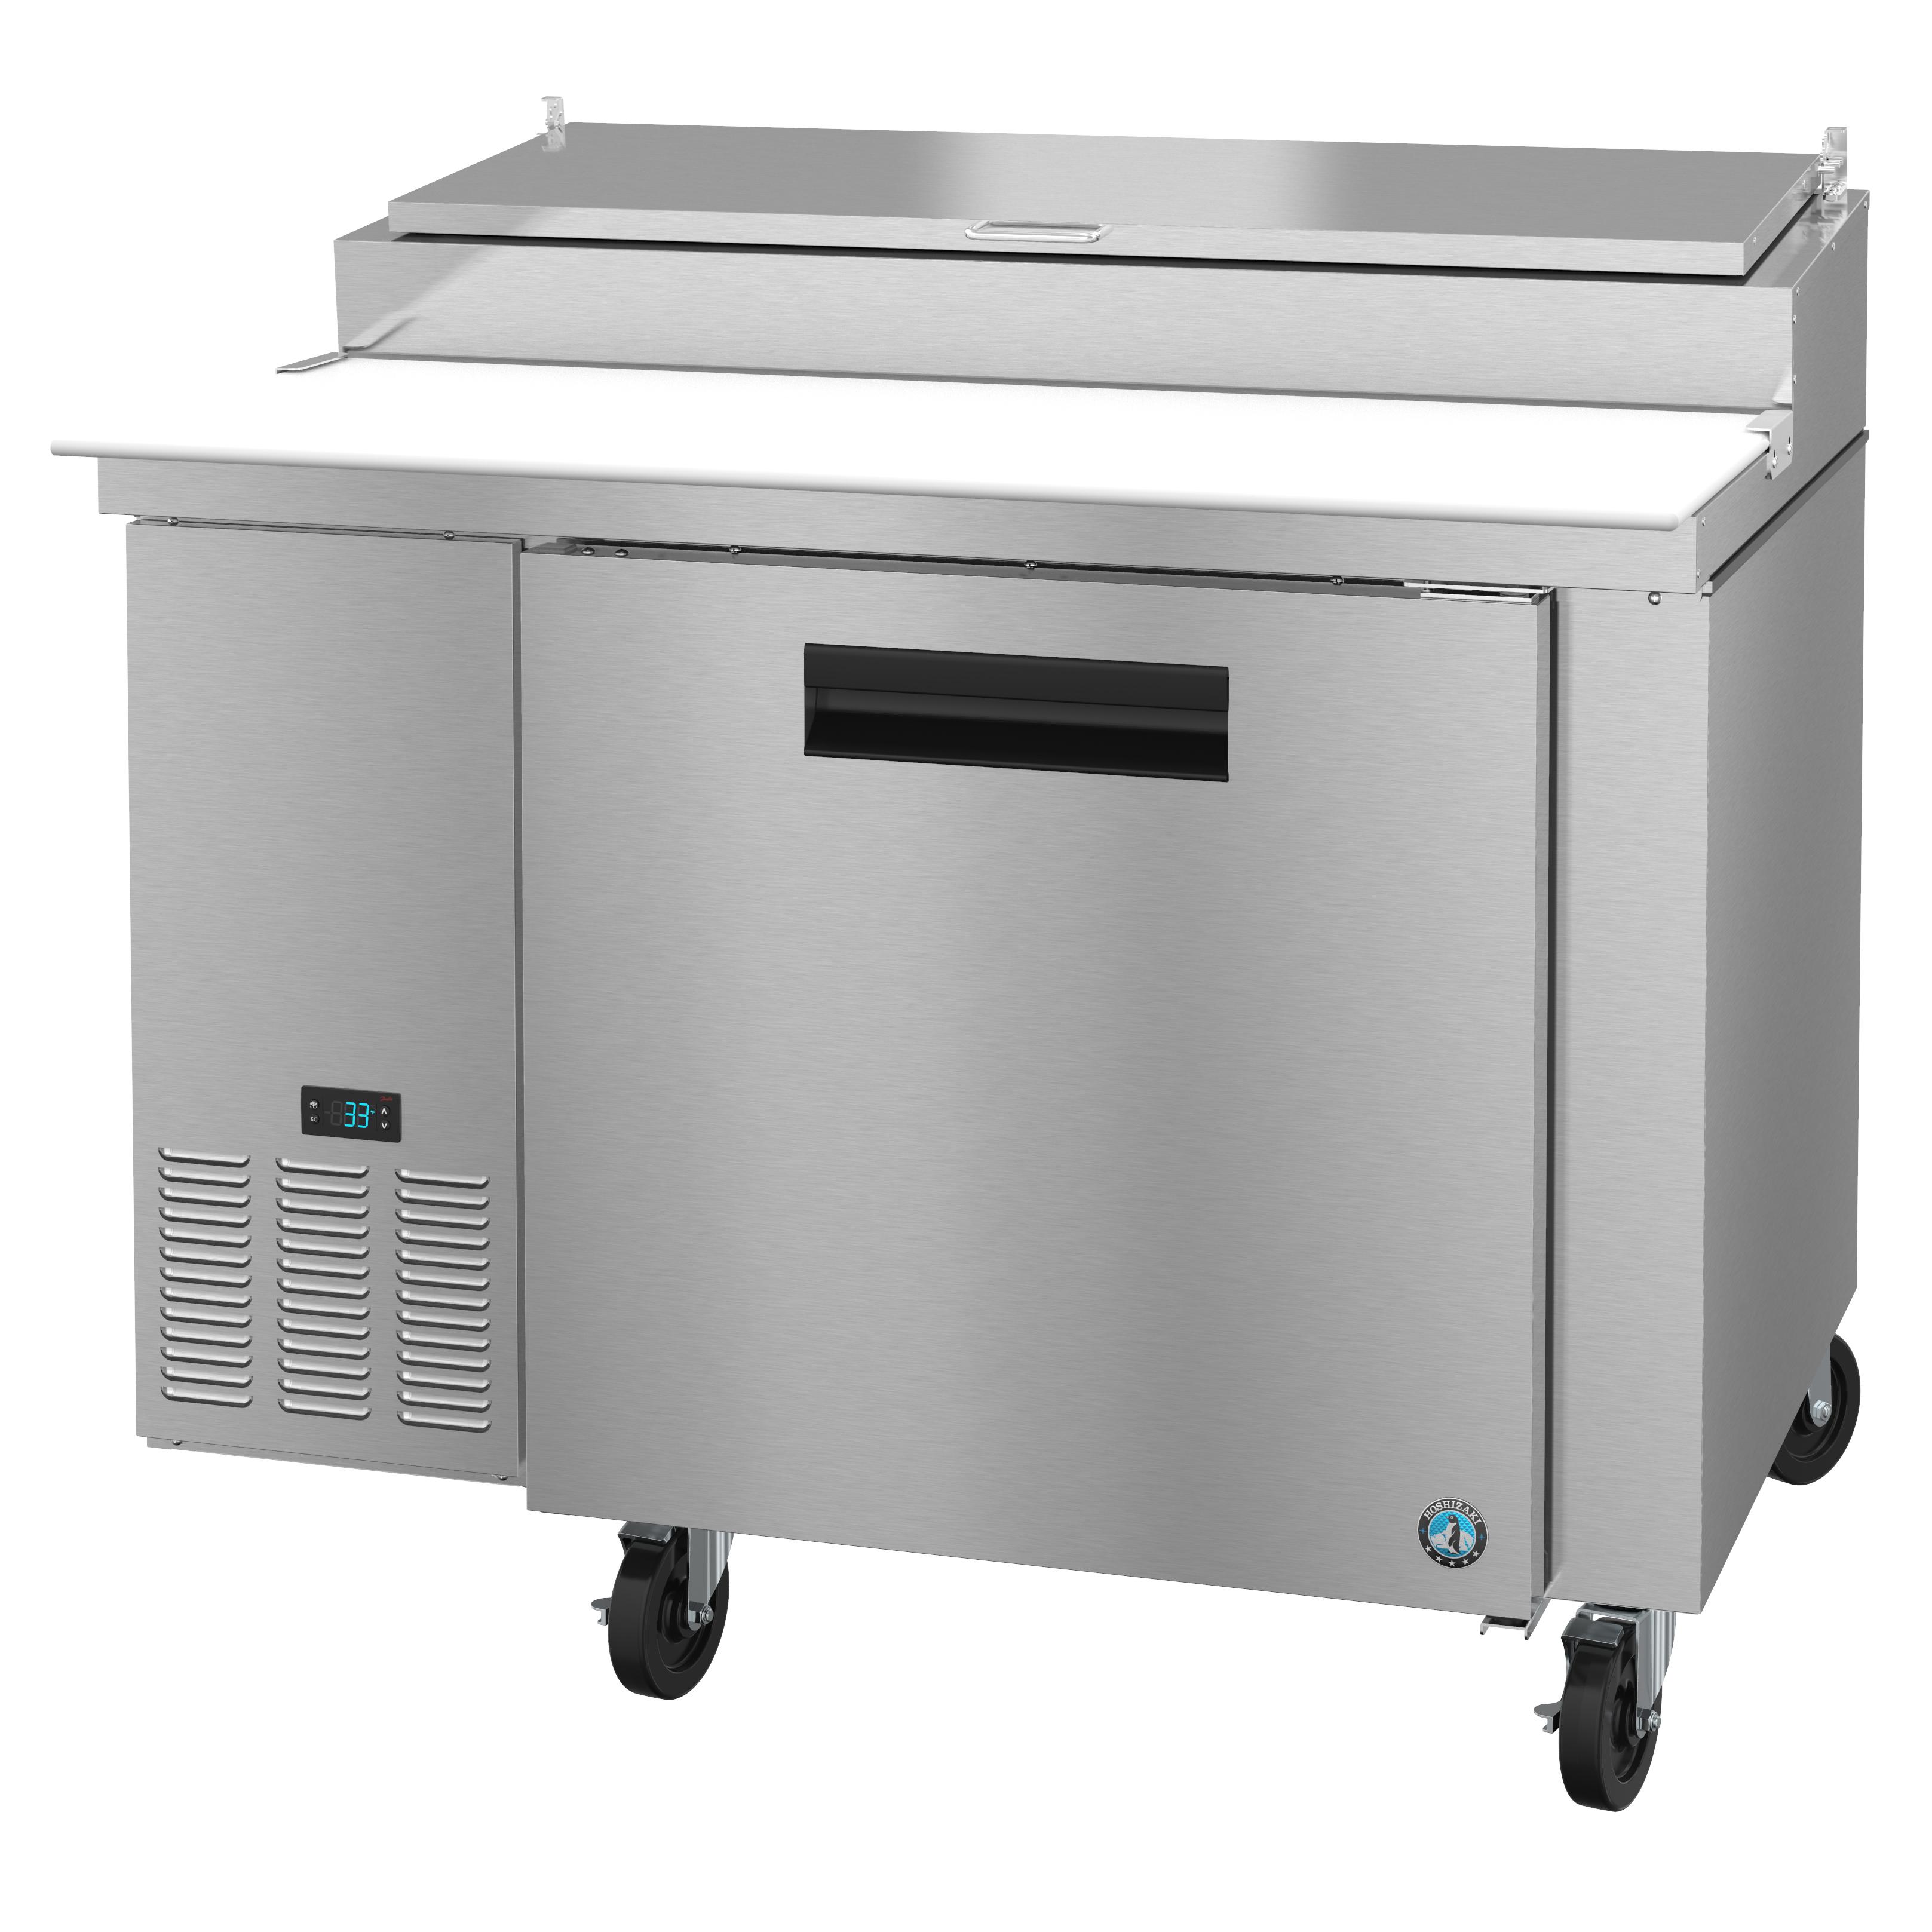 Hoshizaki PR46A refrigerated counter, pizza prep table